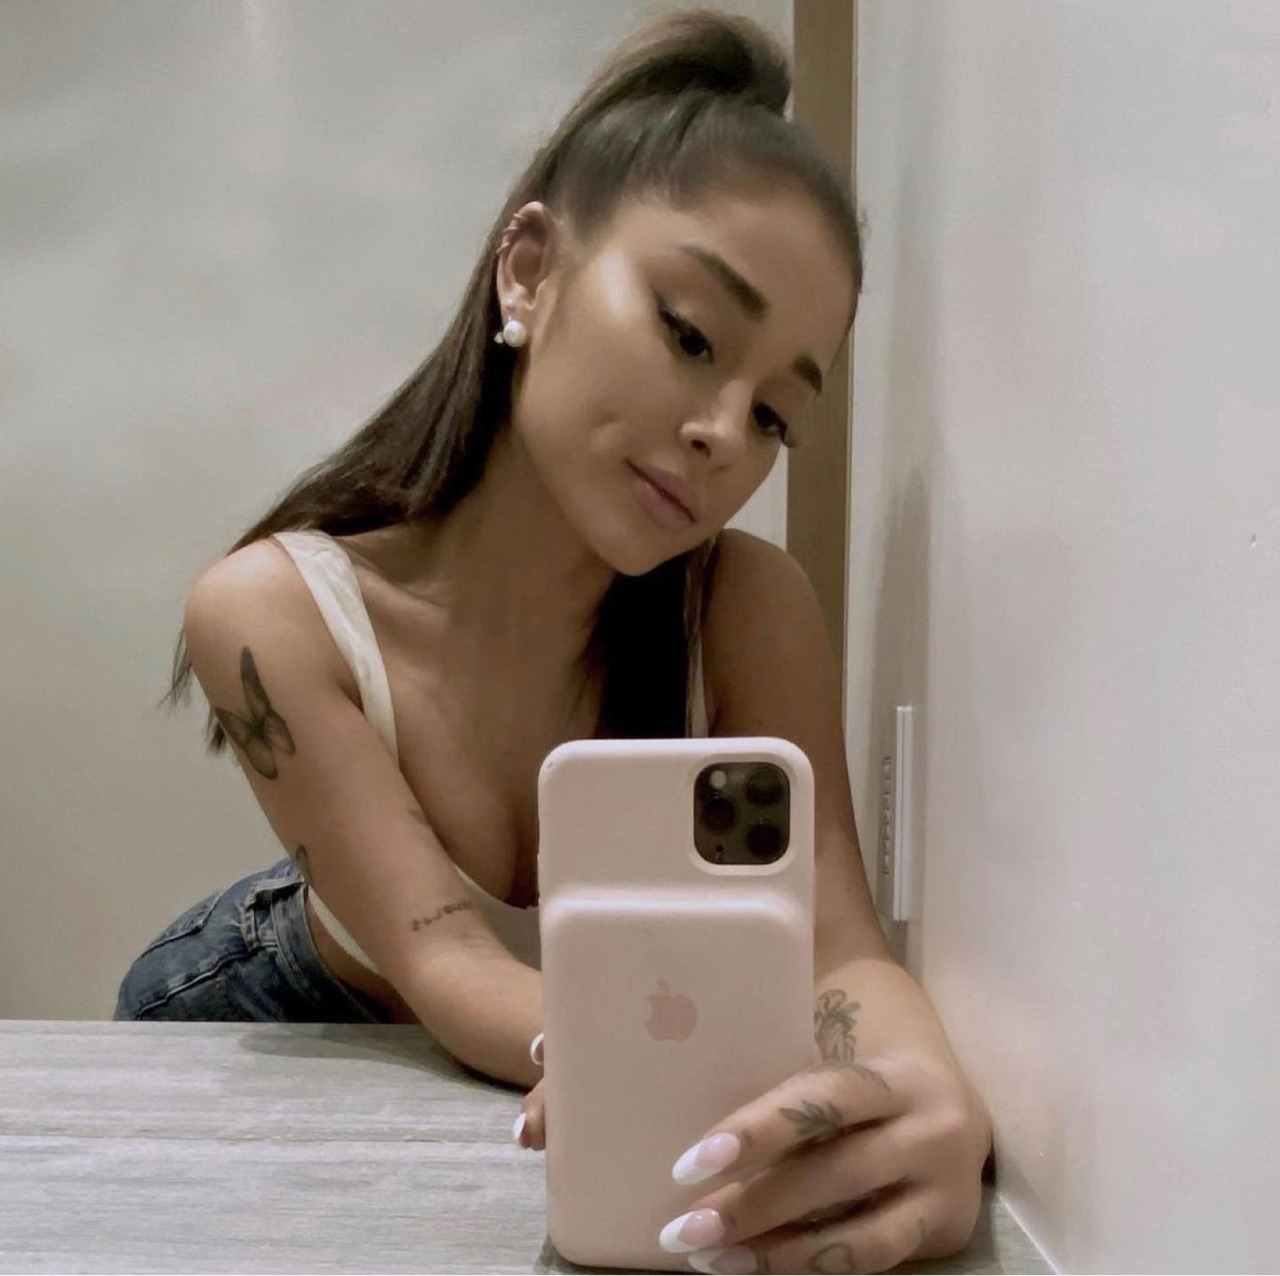 mirror pic, ariana's tattoos, and ariana grande image